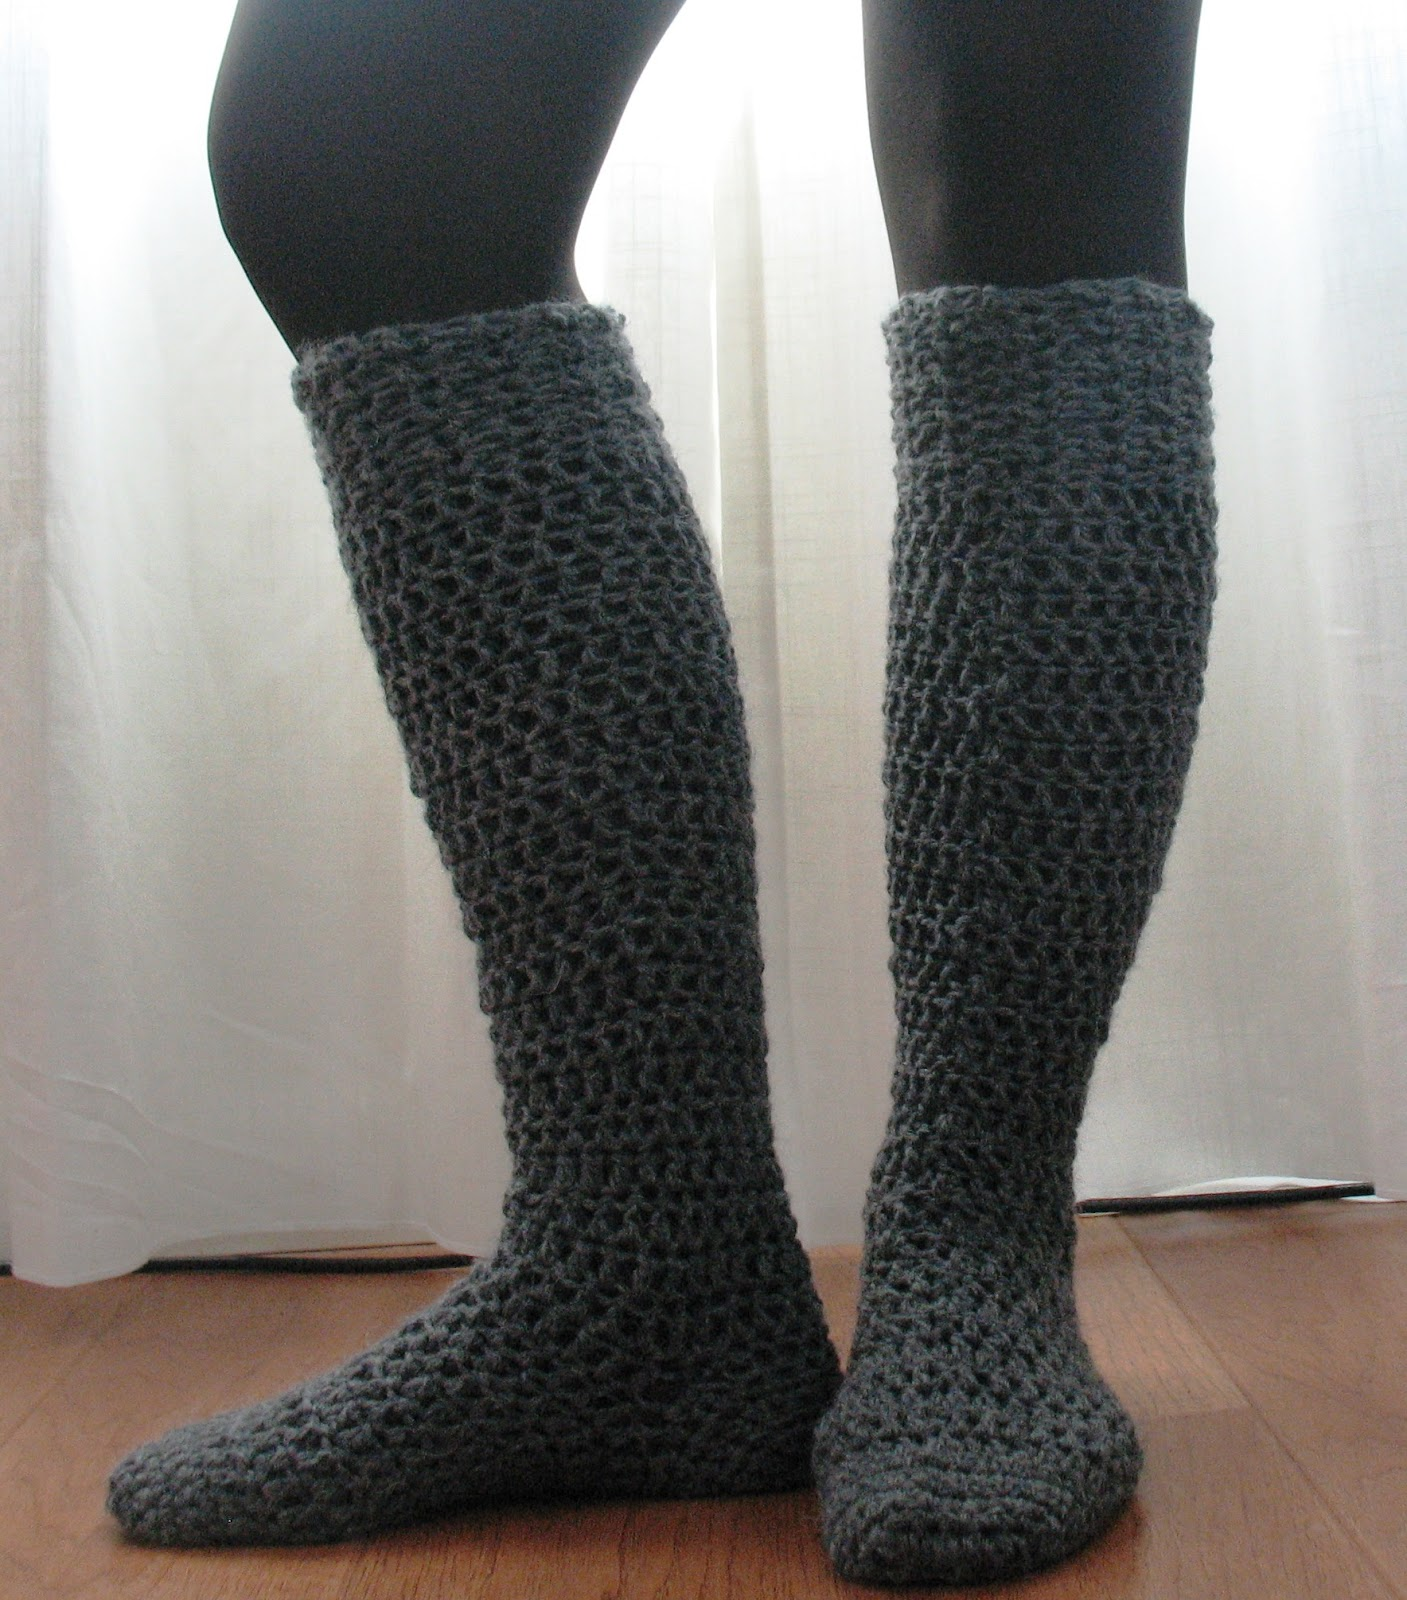 Ball Hank N Skein Knee High Boot Socks